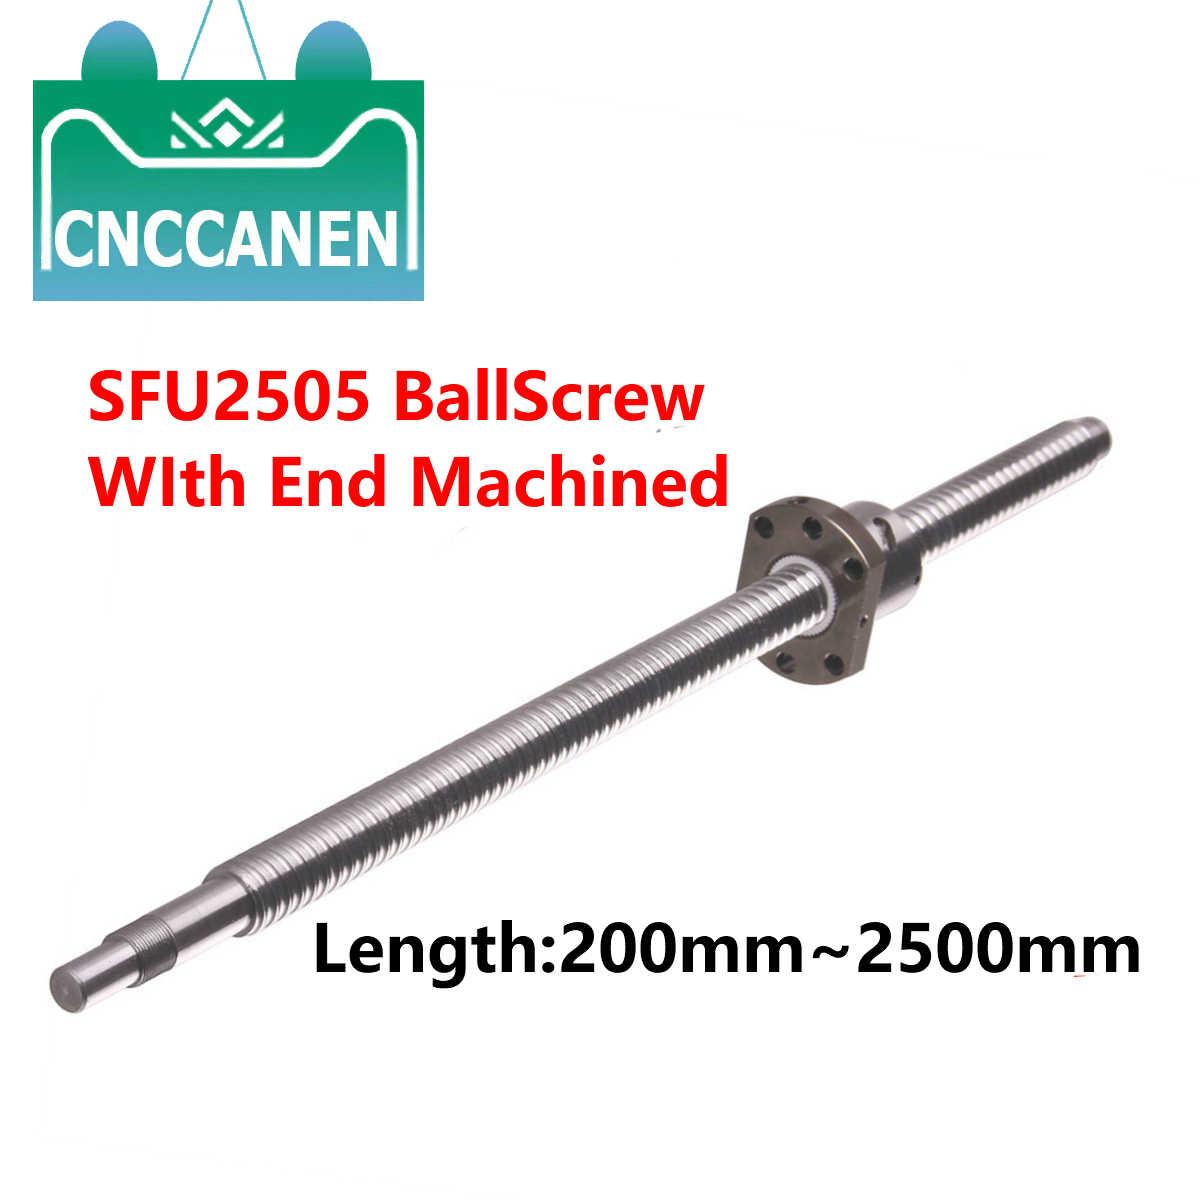 BK//BF15 end bearing support CNC 1 anti backlash 20mm ballscrew RM2005-600mm-C7